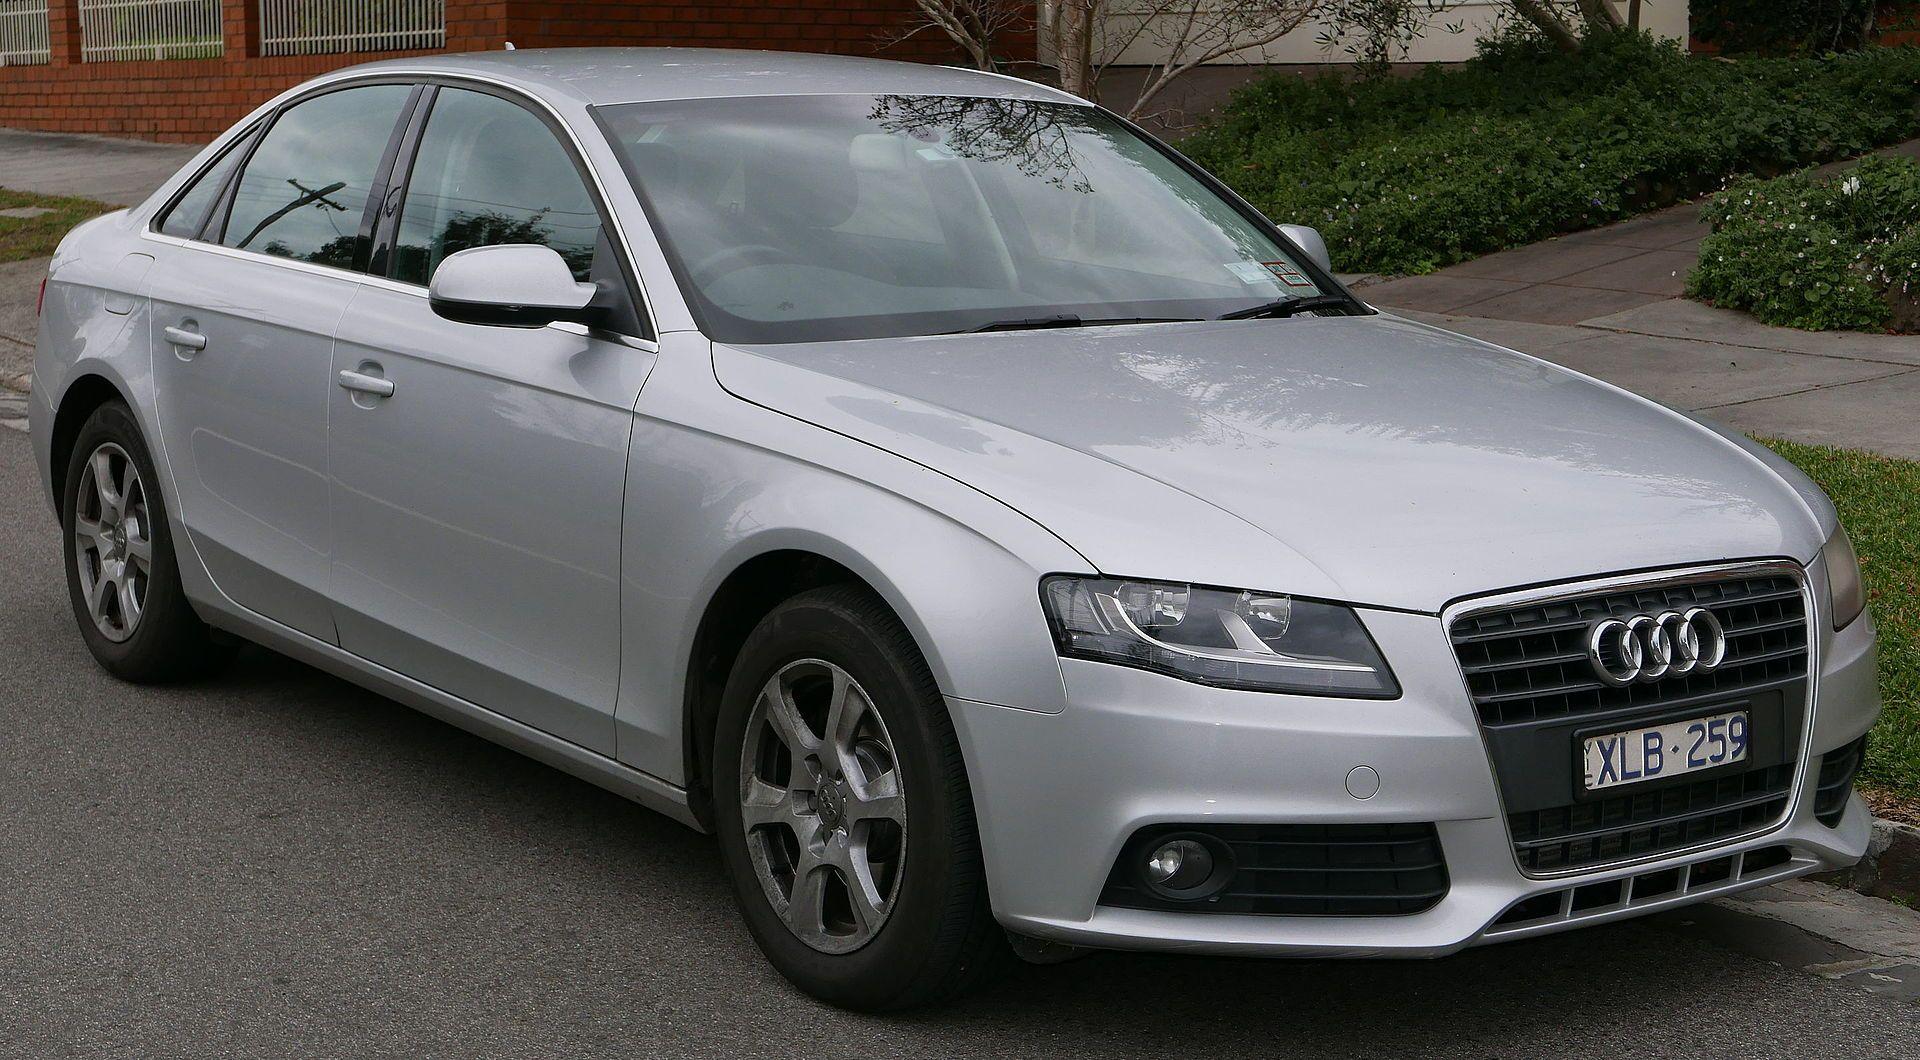 2009 Audi A4 (8K MY10) 2.0 TDI sedan (2015-07-09) 01.jpg | Audi a4 ...